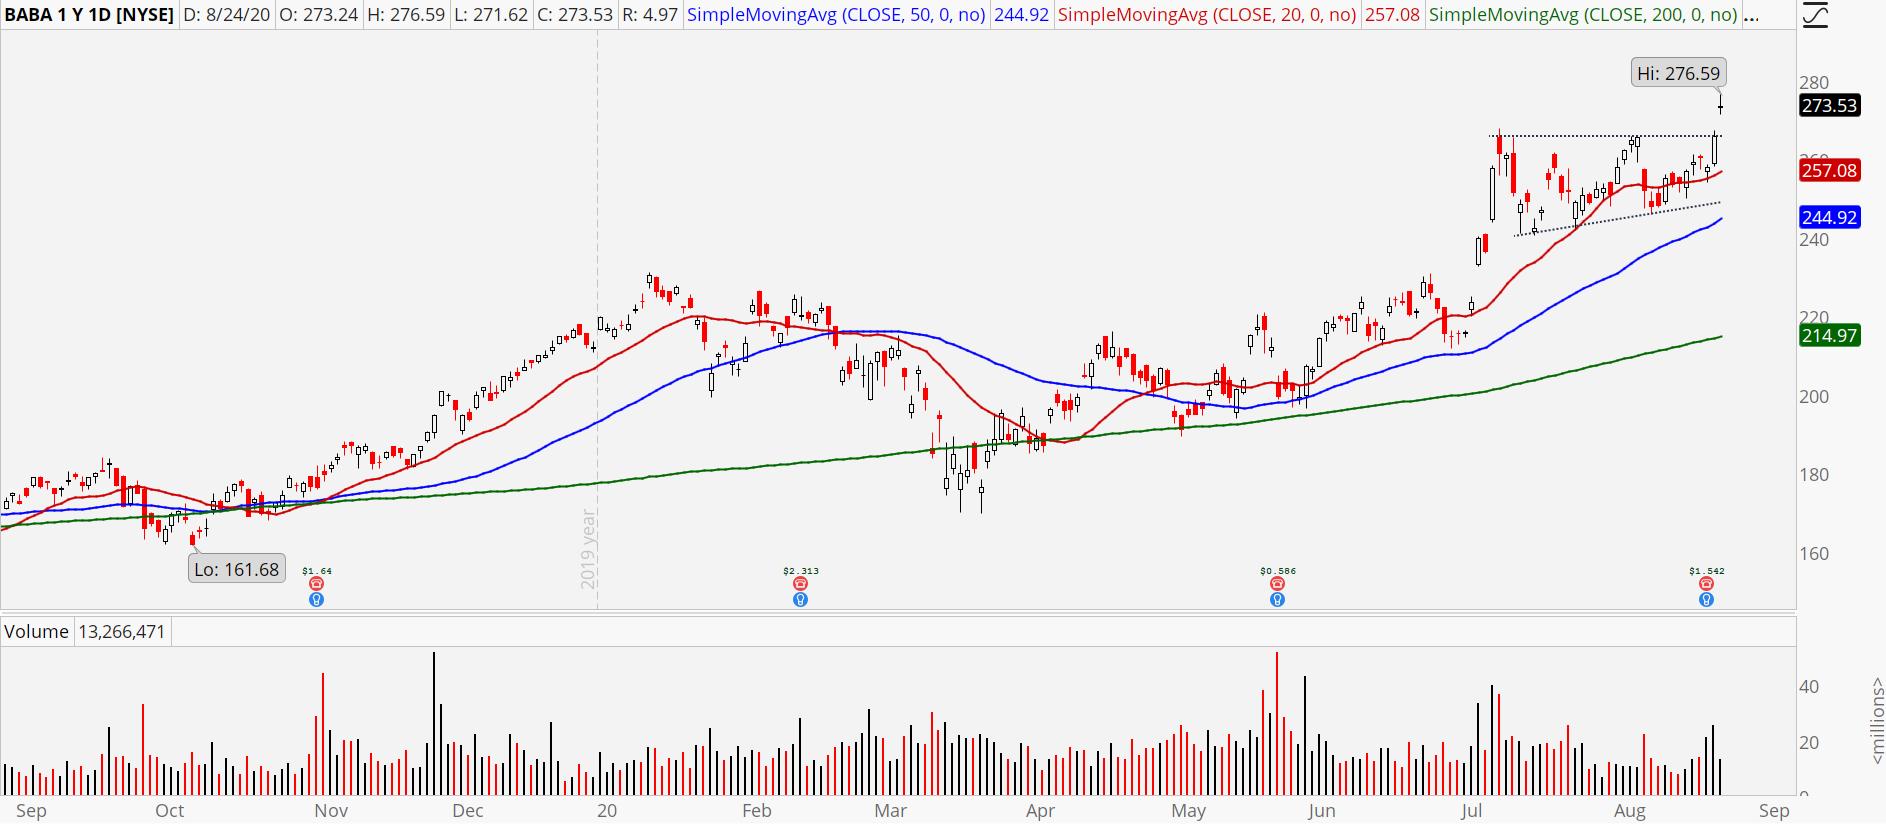 Alibaba (BABA) daily stock chart showing range break